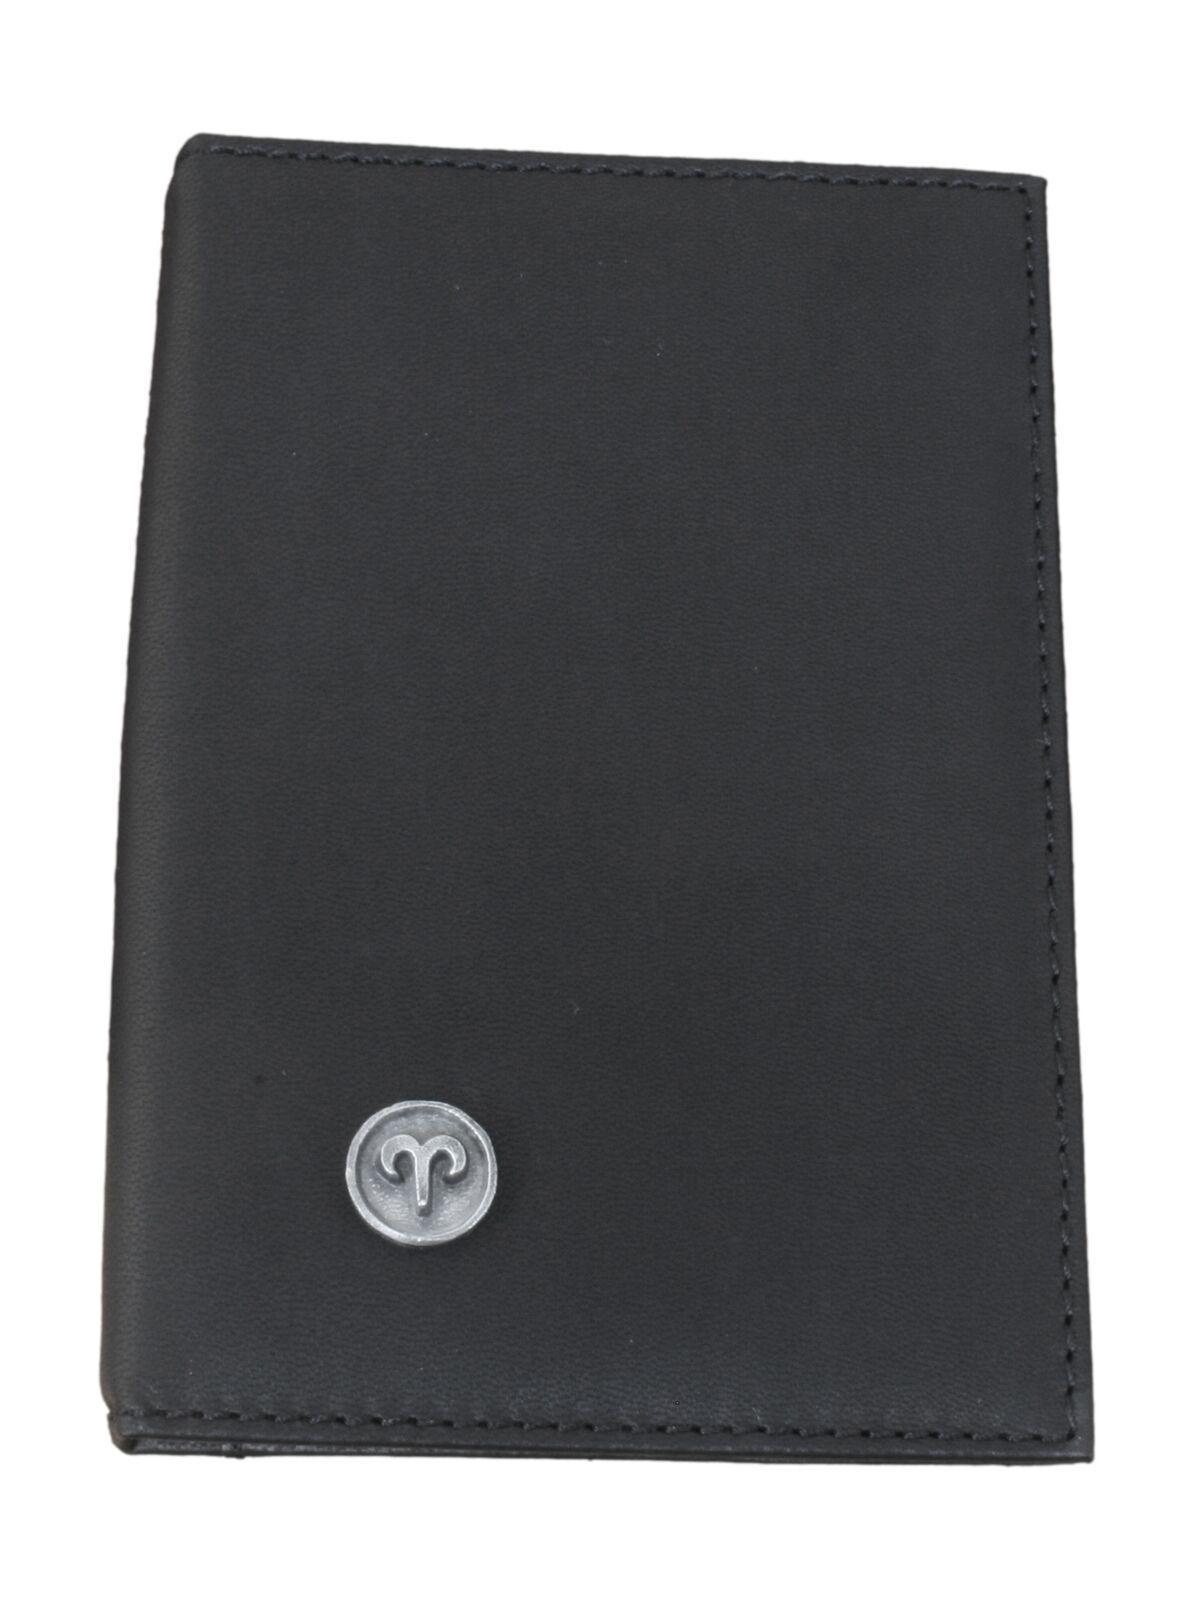 Aries Zodiac Black Leather Shotgun/Firearms Certificate Holder 12